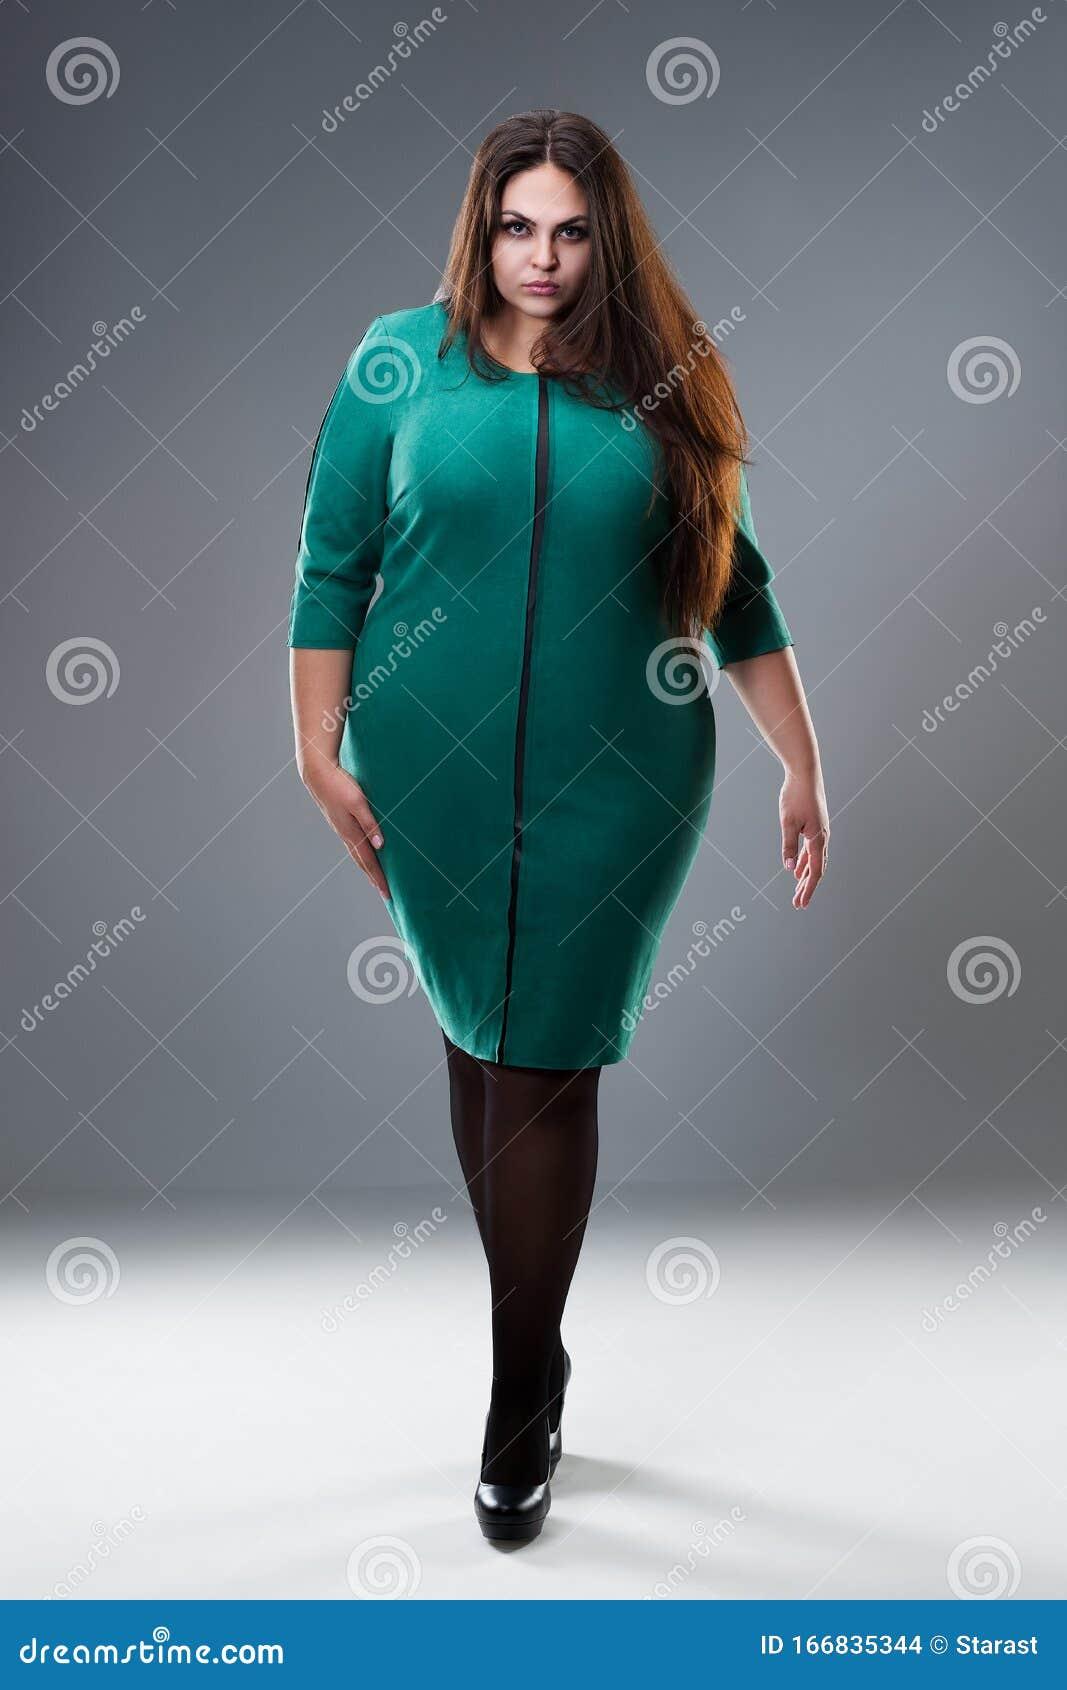 Women overweight beautiful 3 Reasons